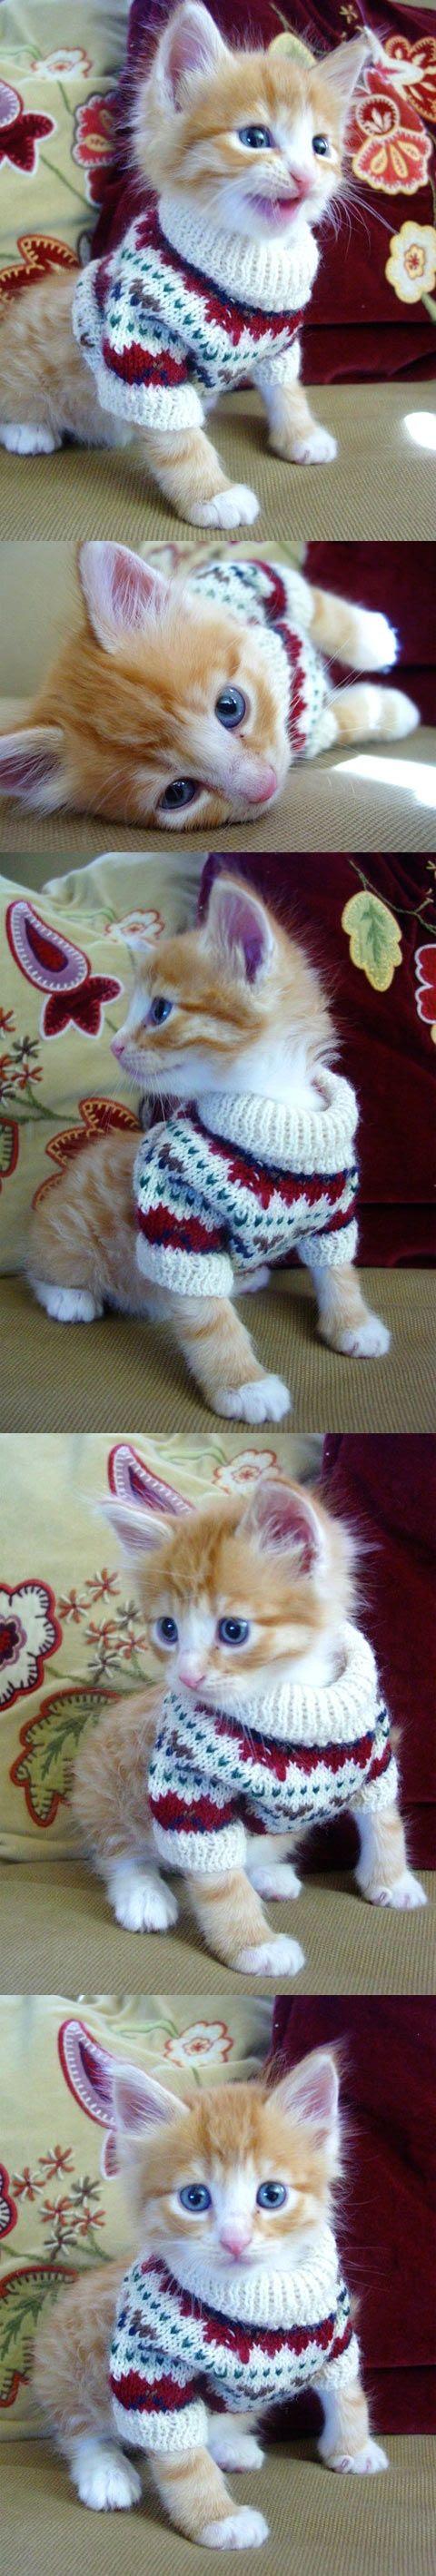 Kitten in a fair isle sweater.